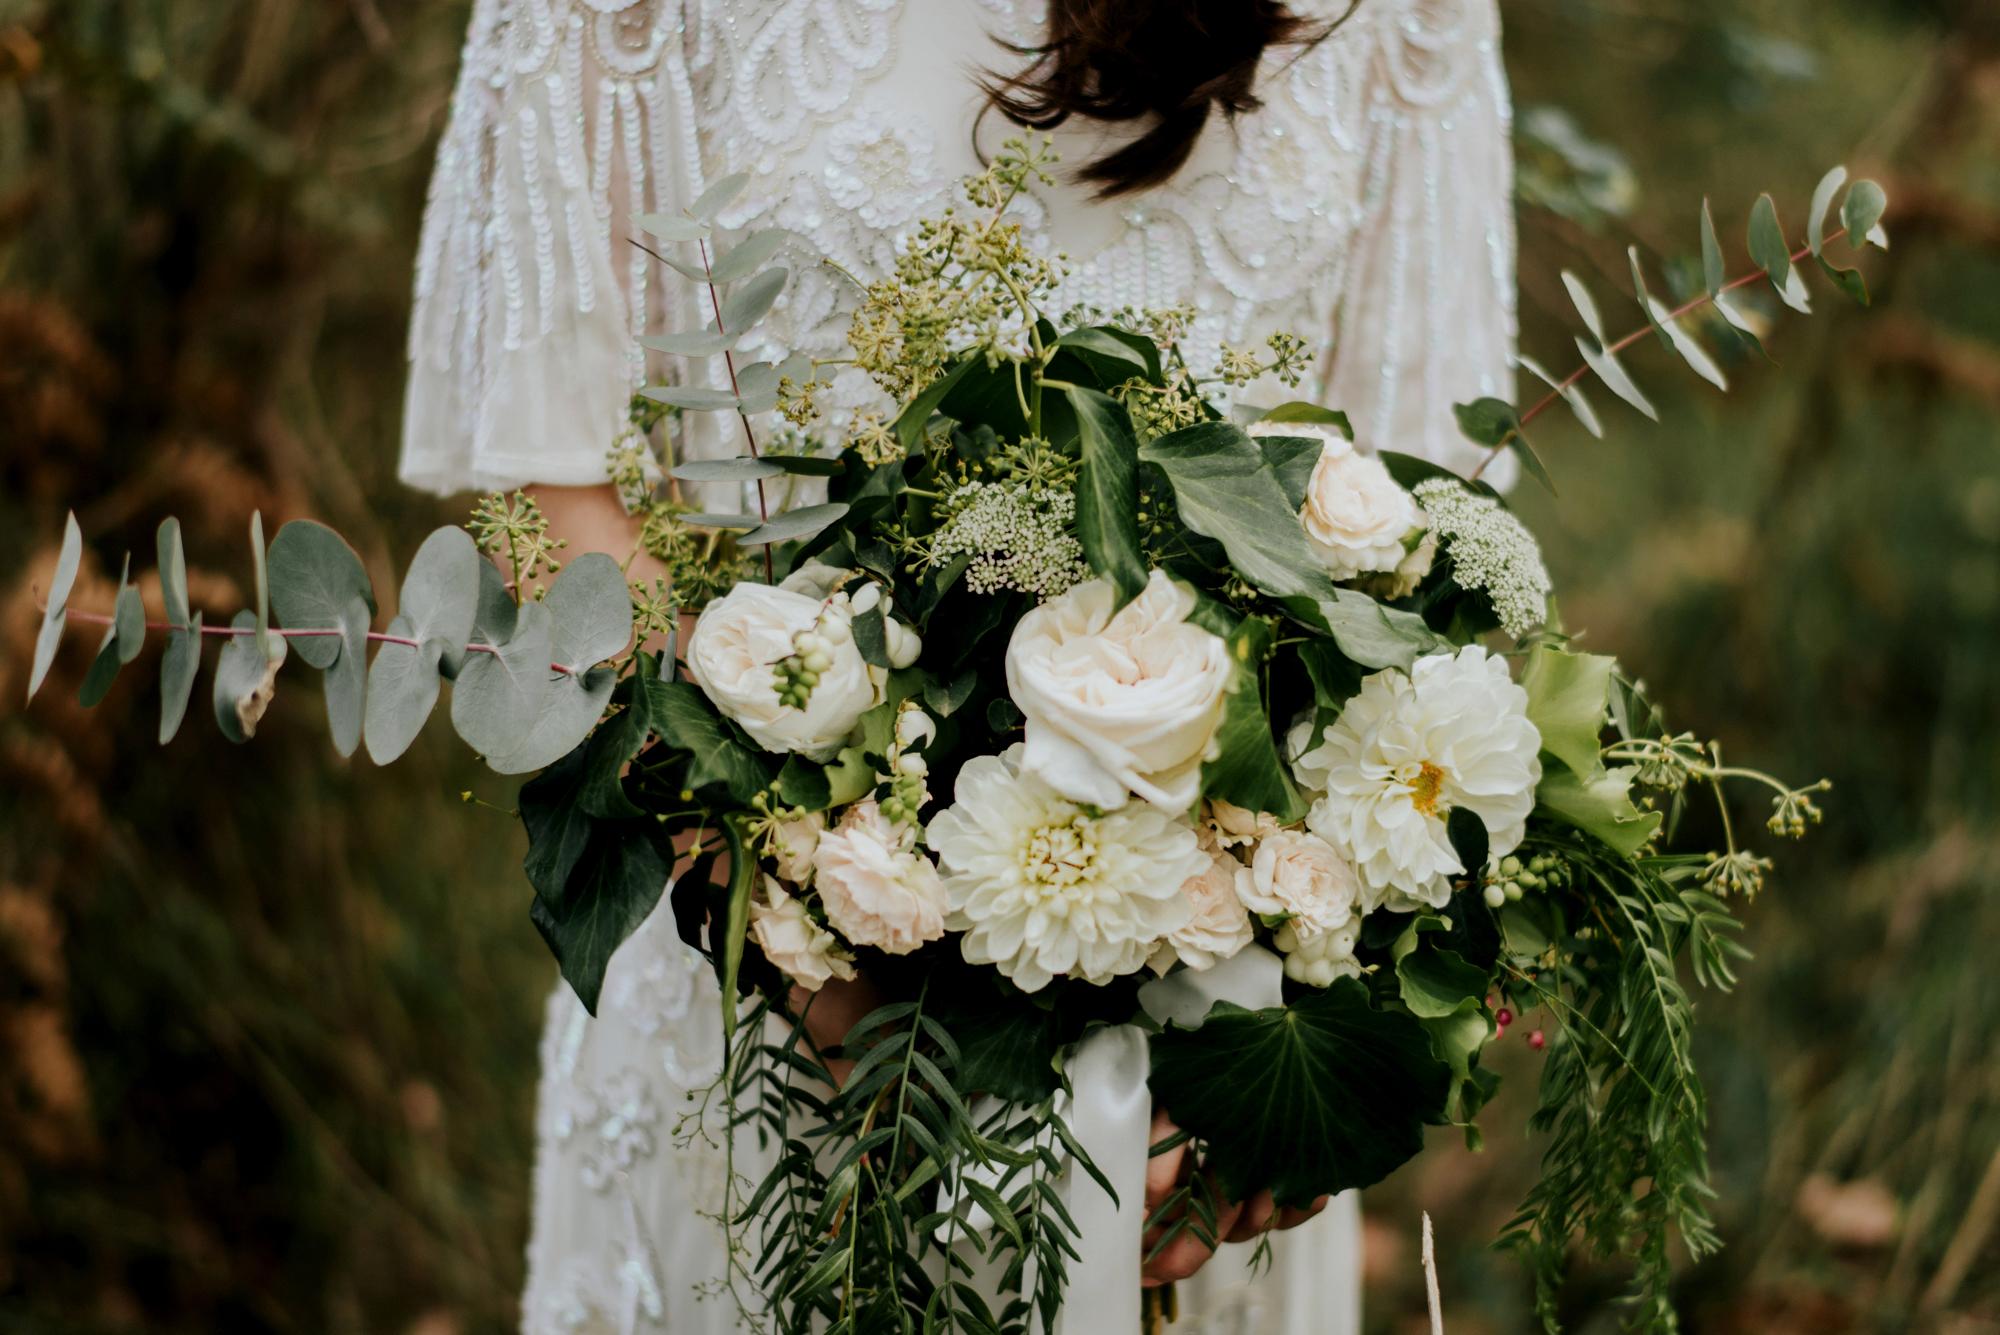 045-melbourne-prewedding-engagement-photography